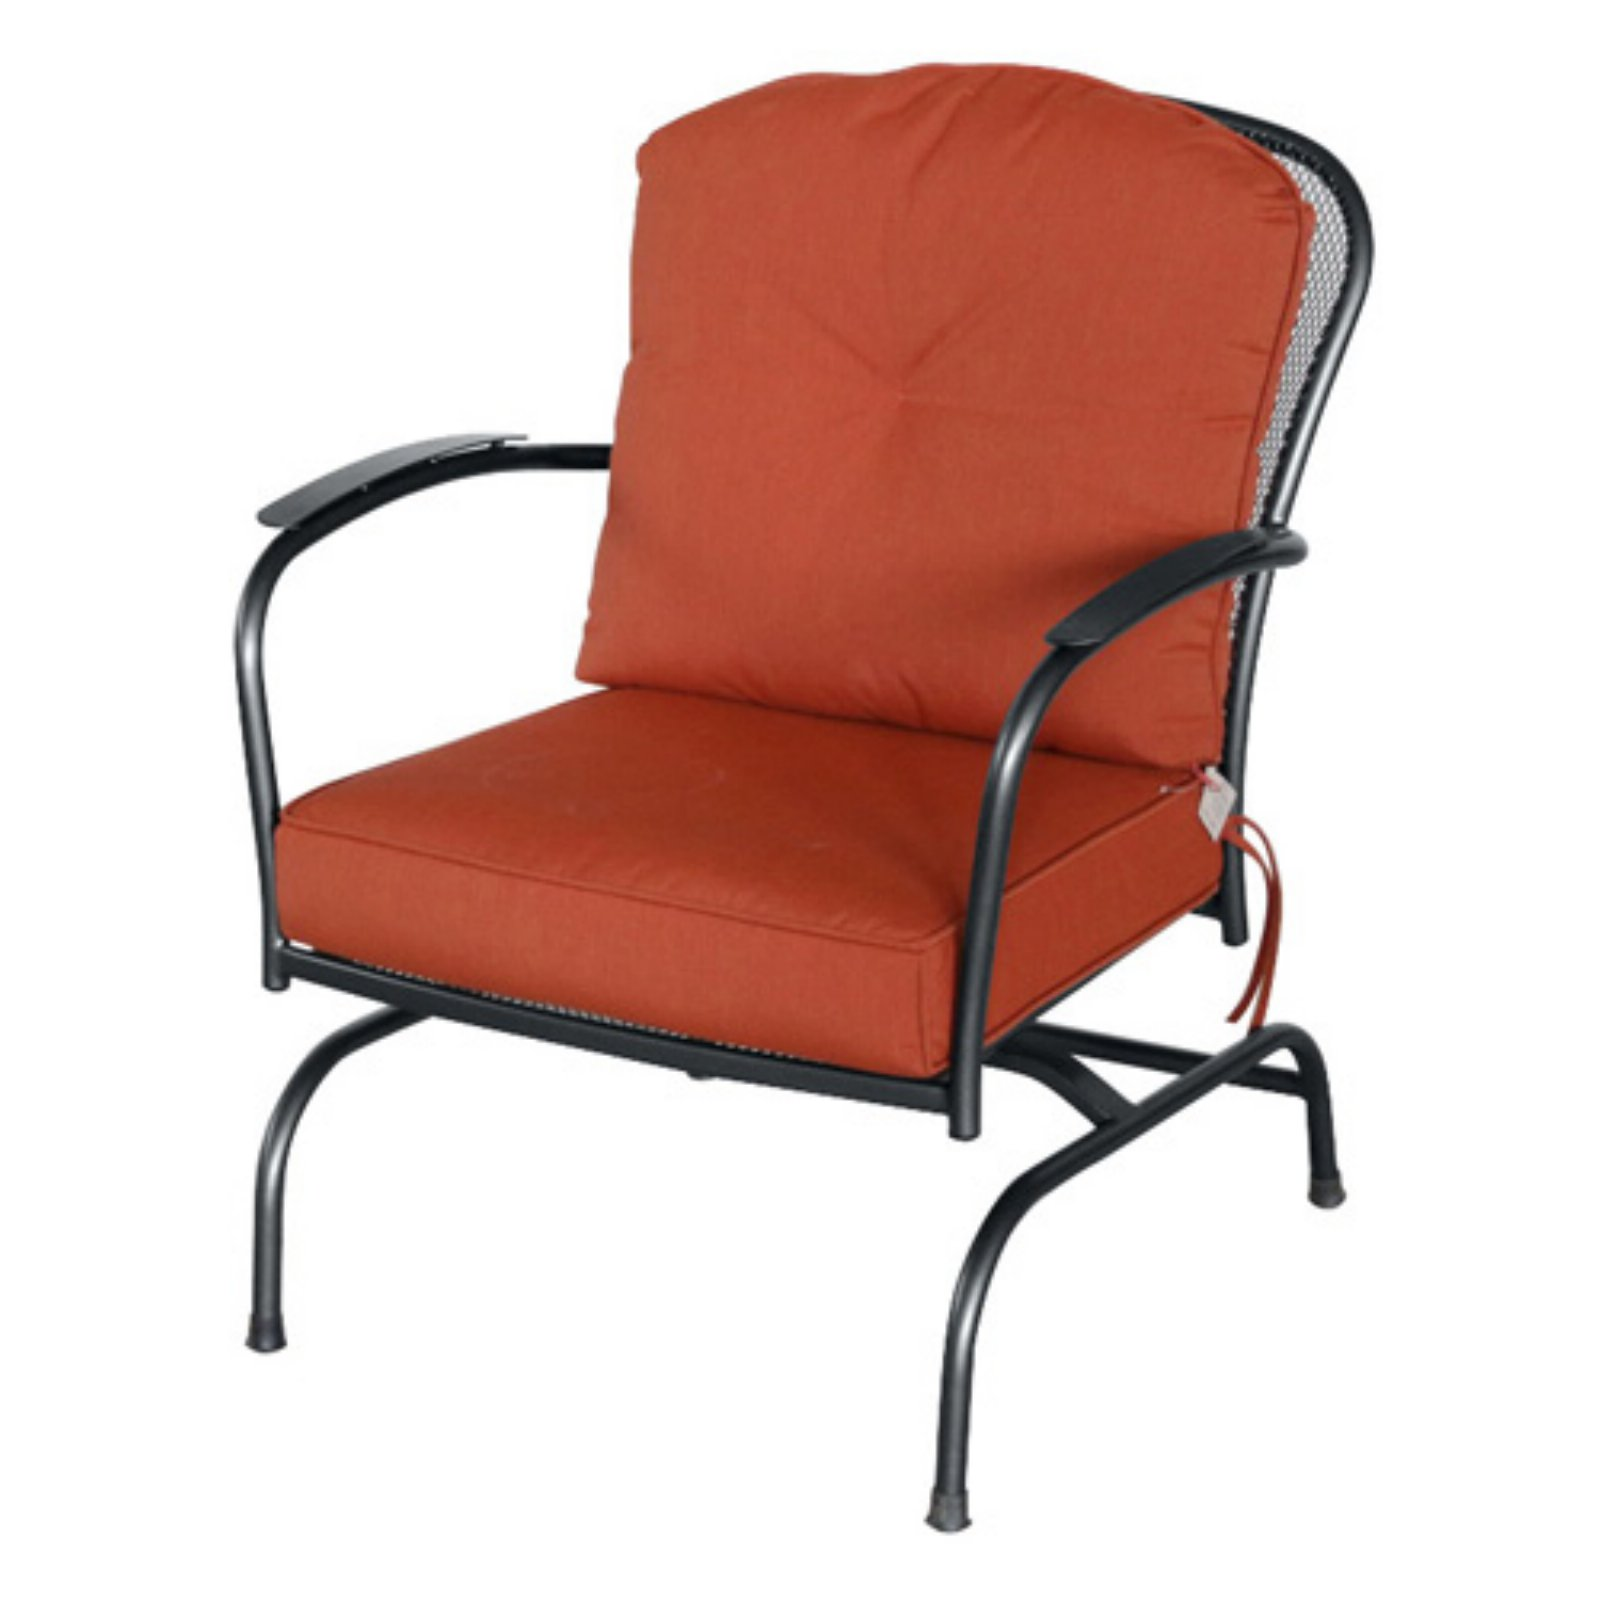 Royal Garden Monata Steel Outdoor Action Chair - Set of 2 - Black